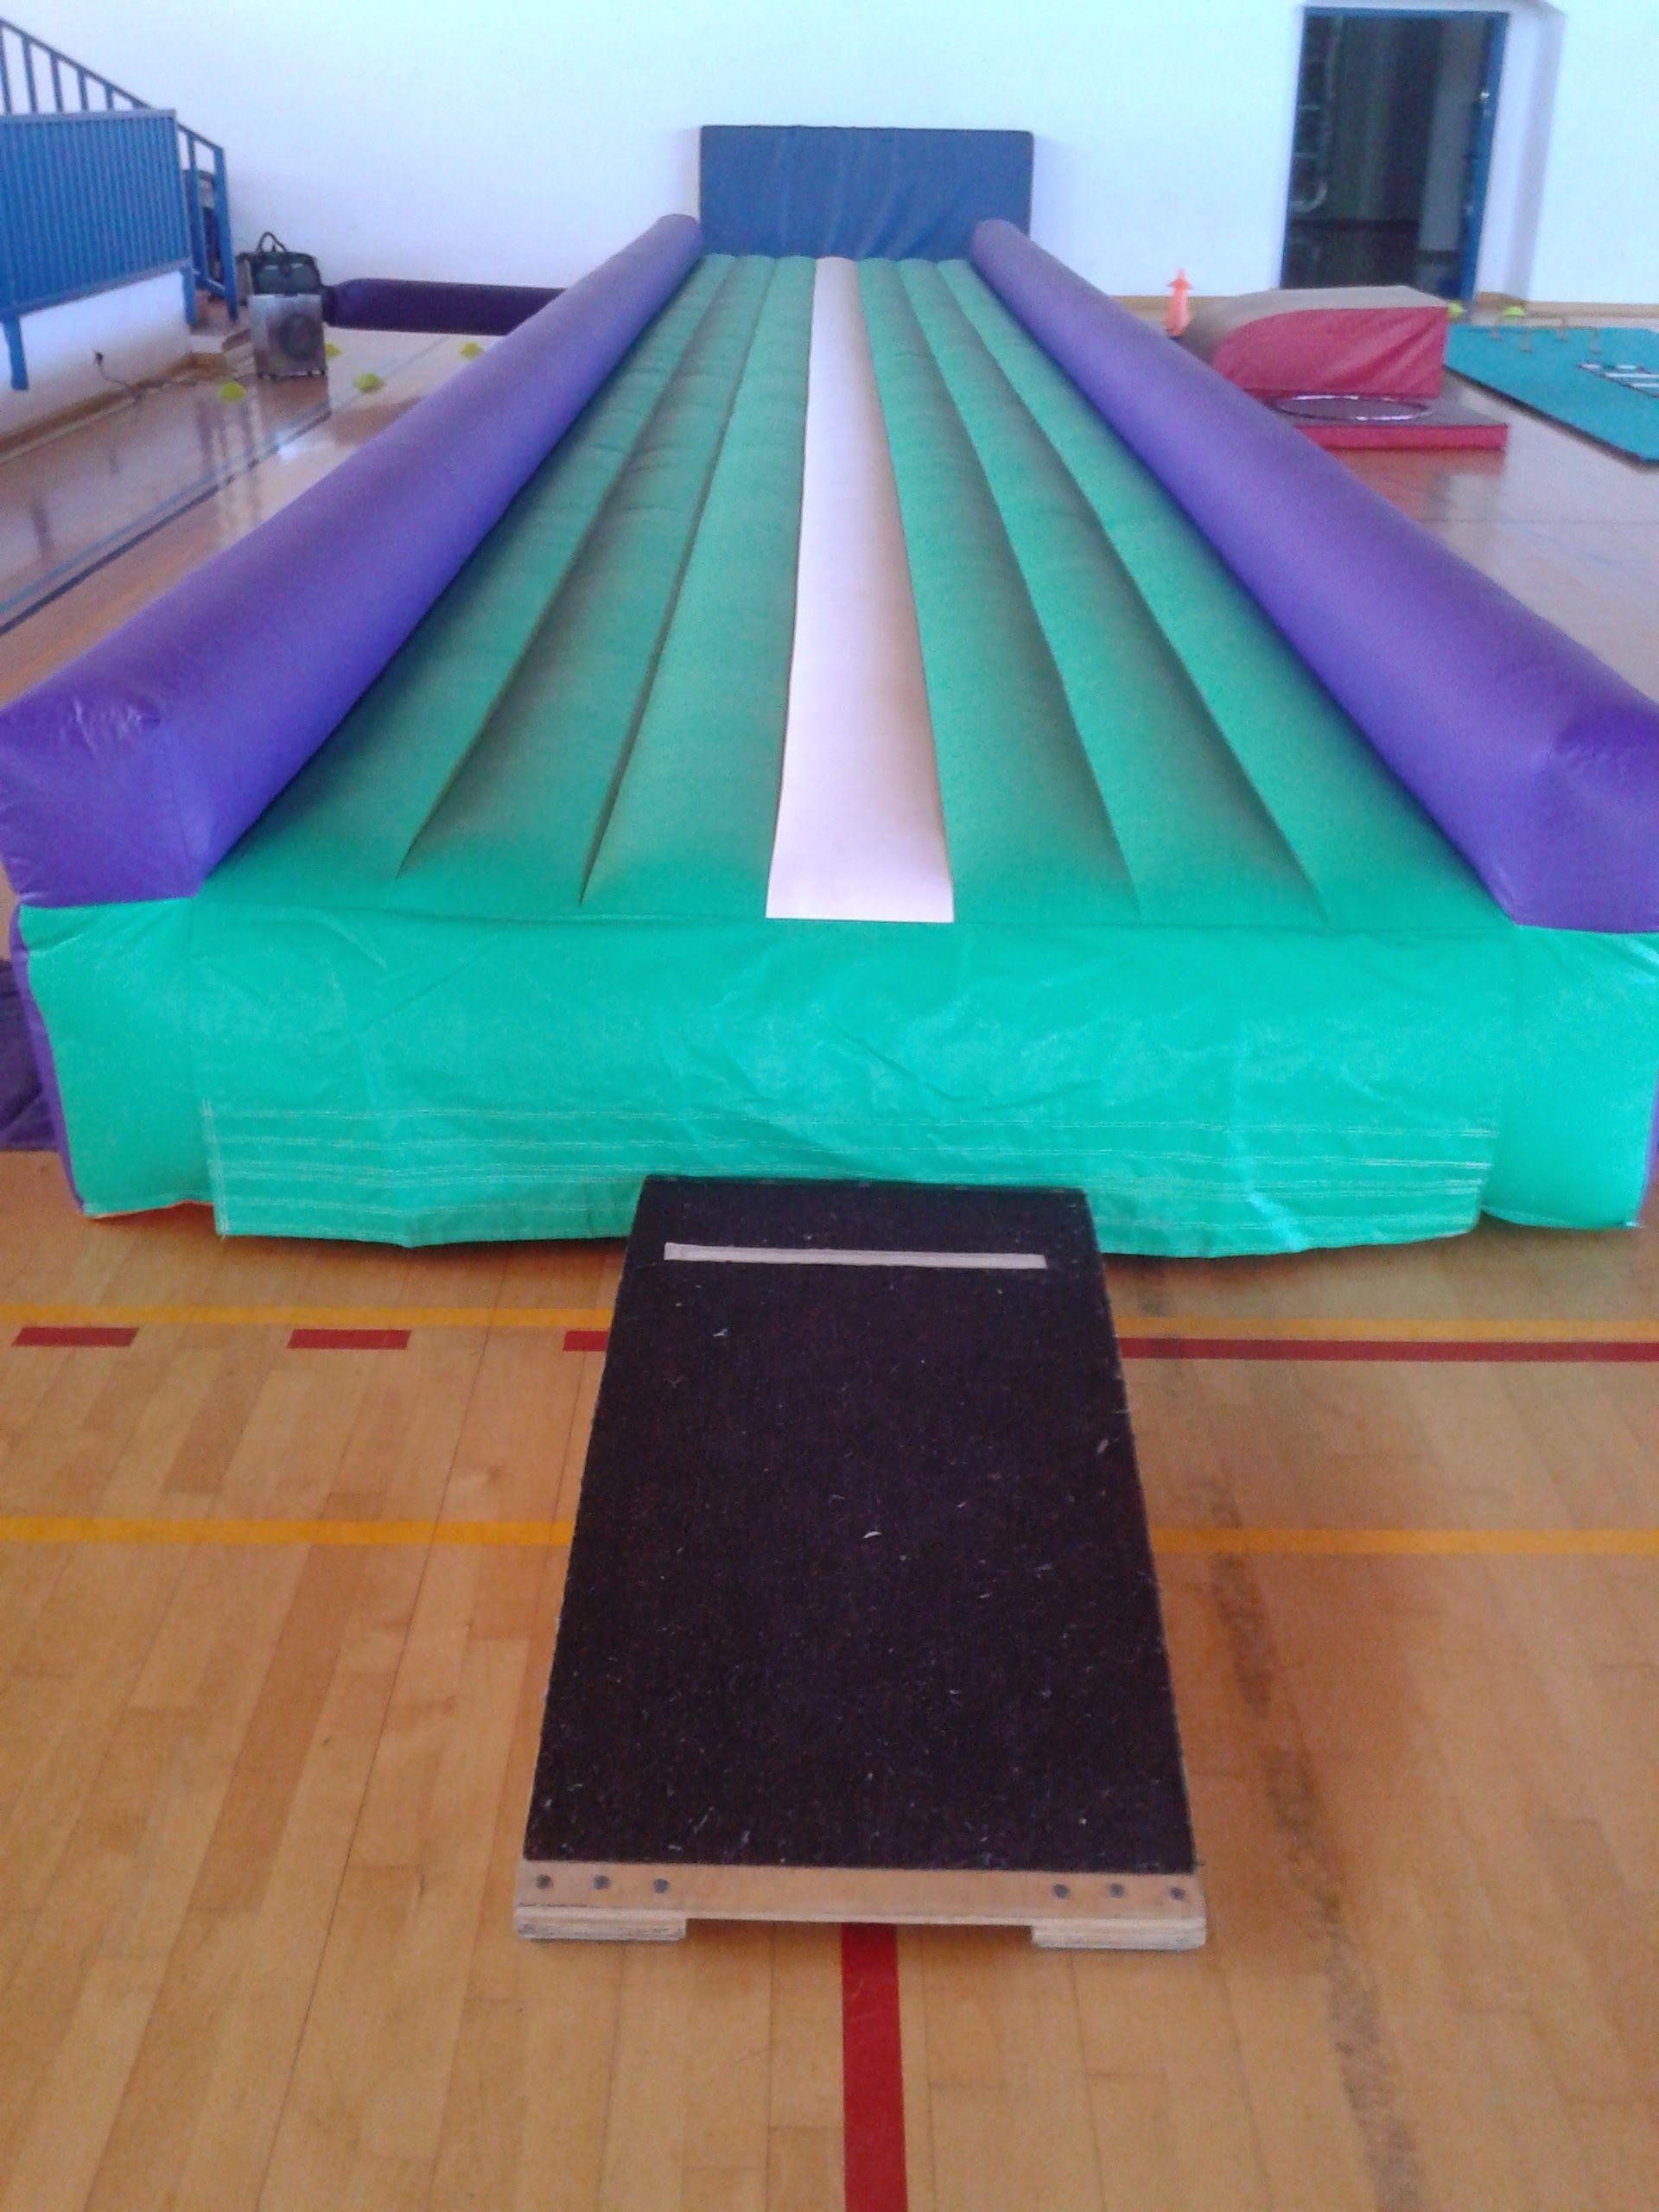 Tumble track ready for springboard practice | Gymnastics ...